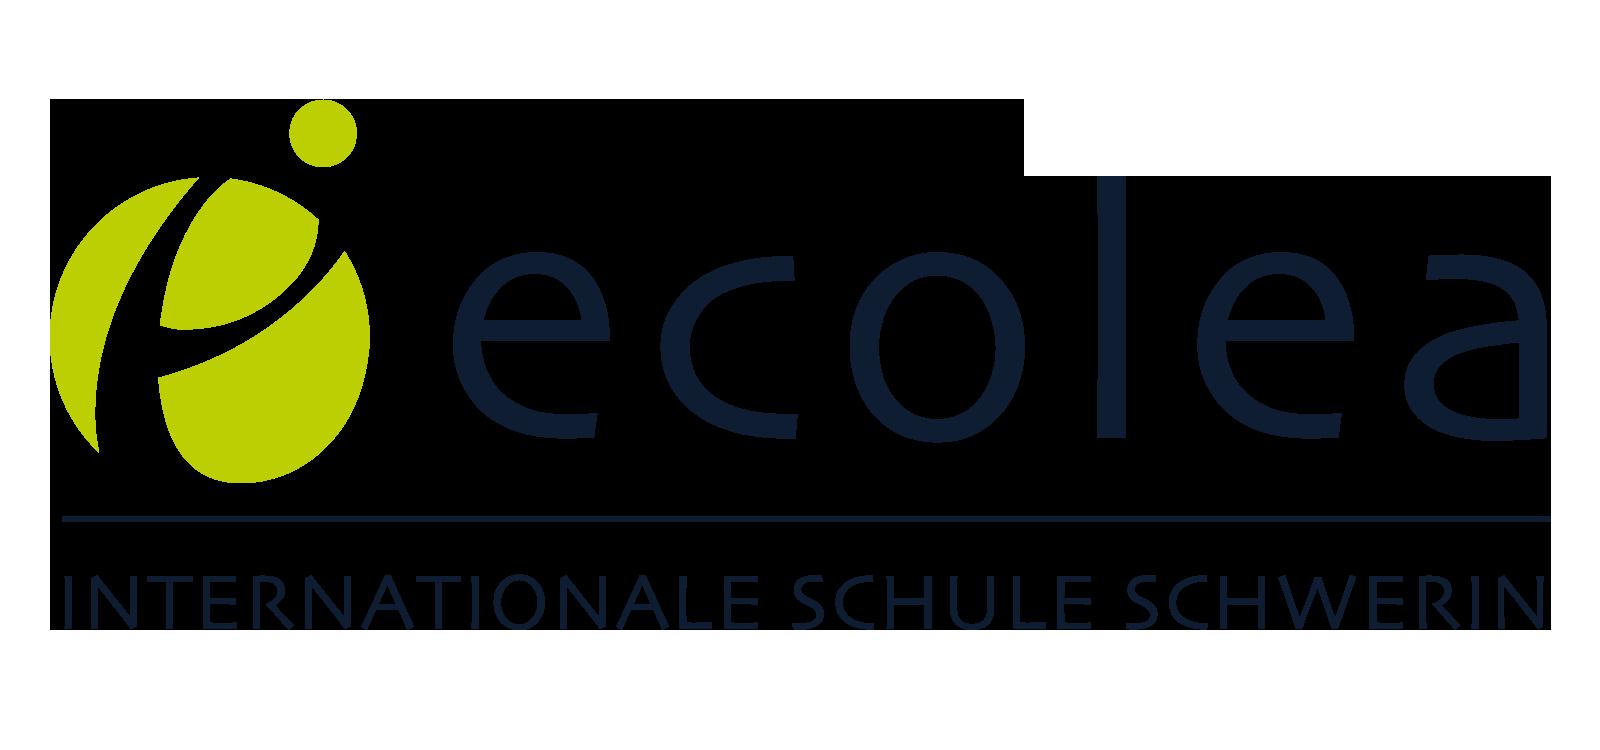 Ecolea - Internationale Schule Schwerin